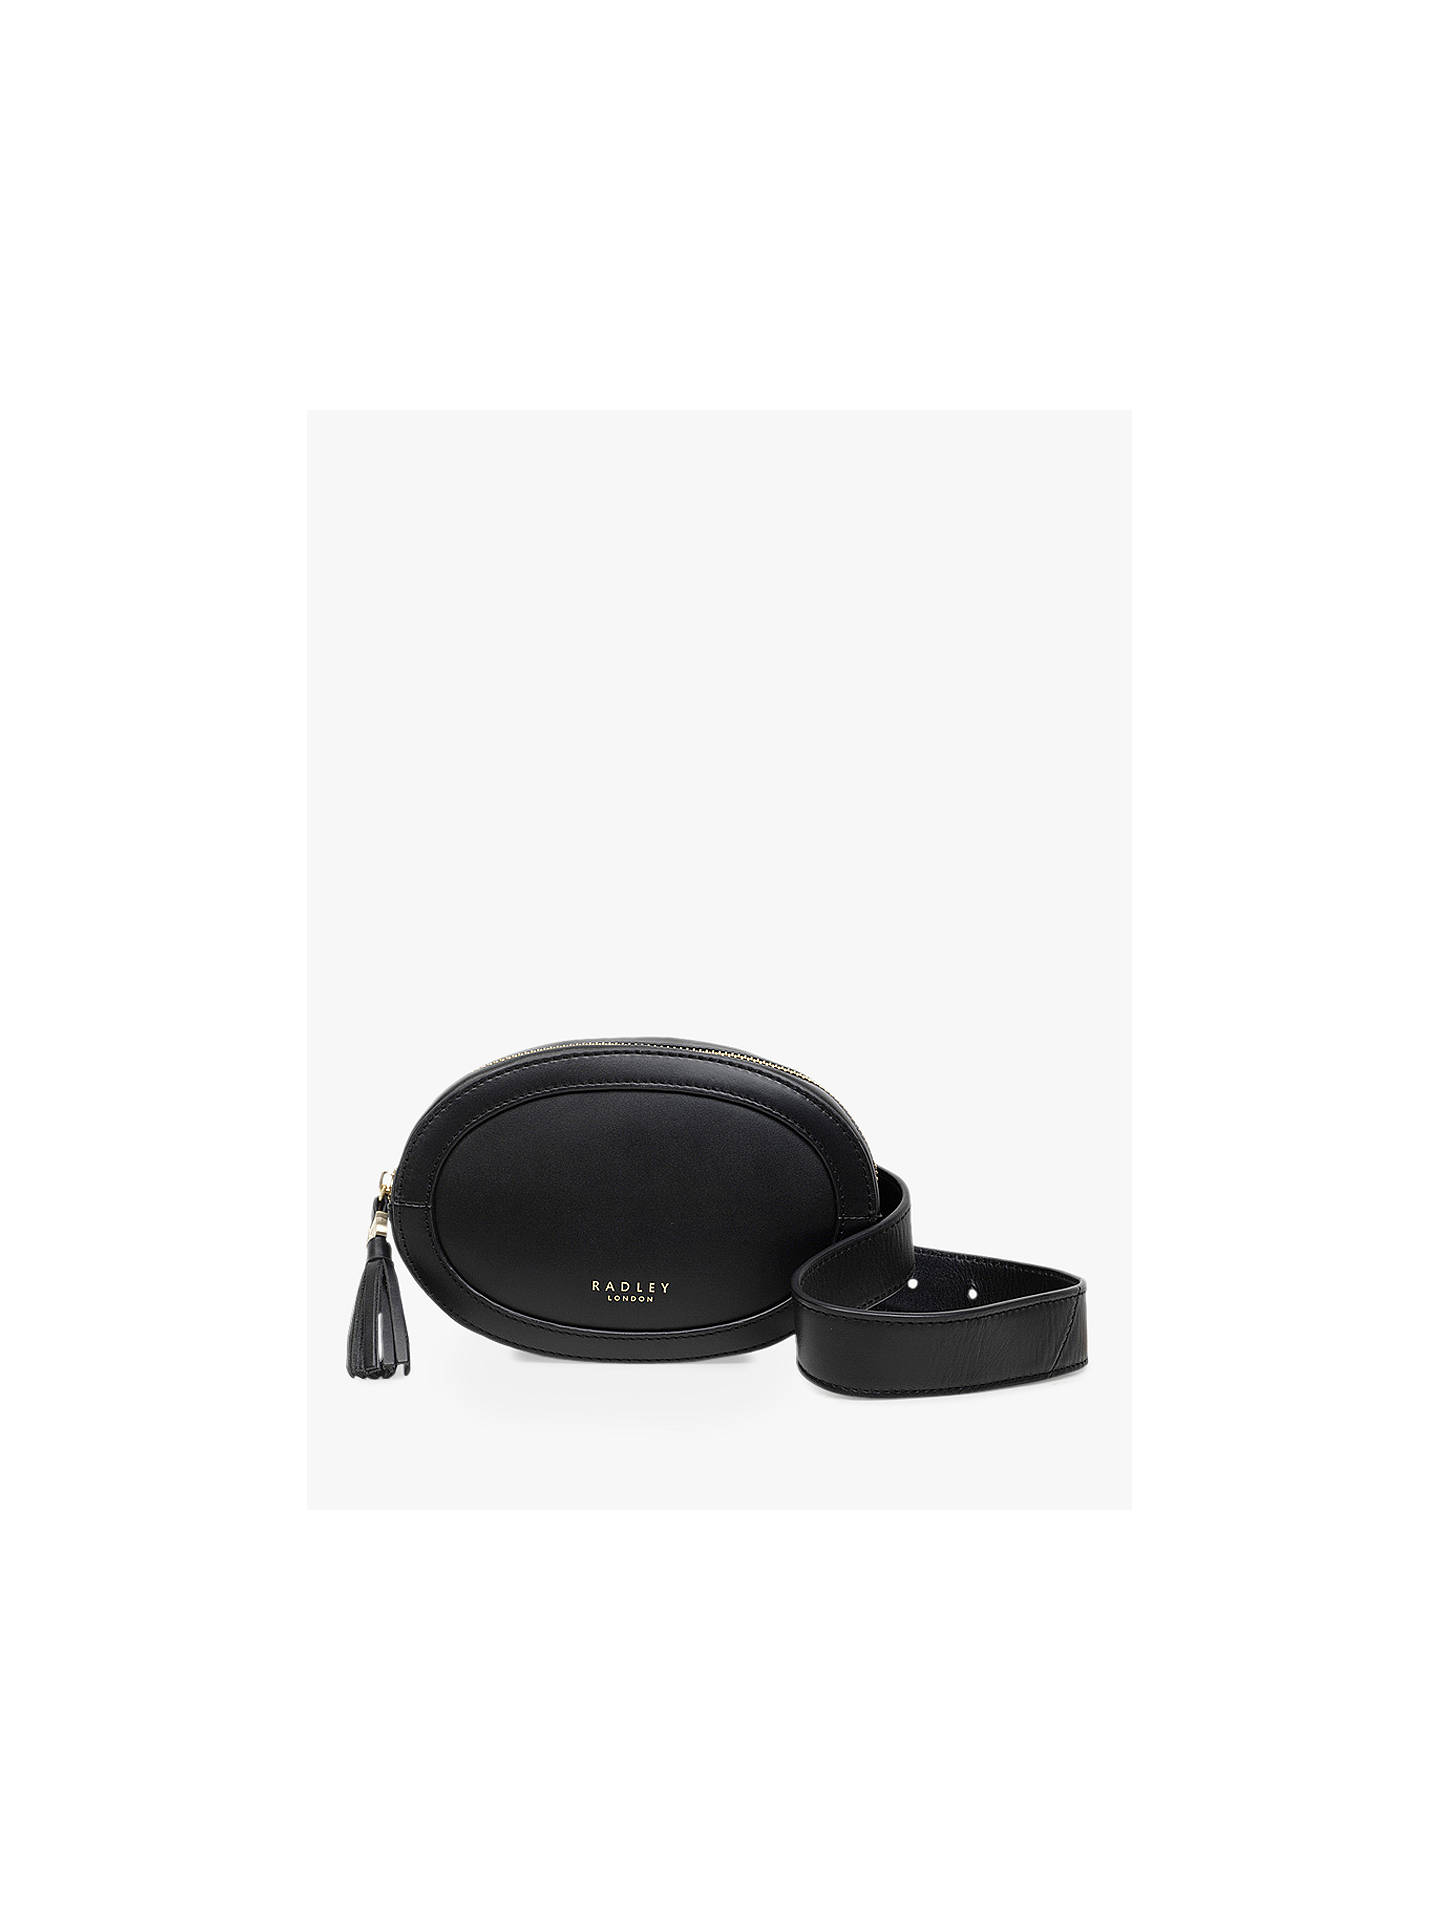 radley-hazel-grove-leather-bumbag,-black by radley